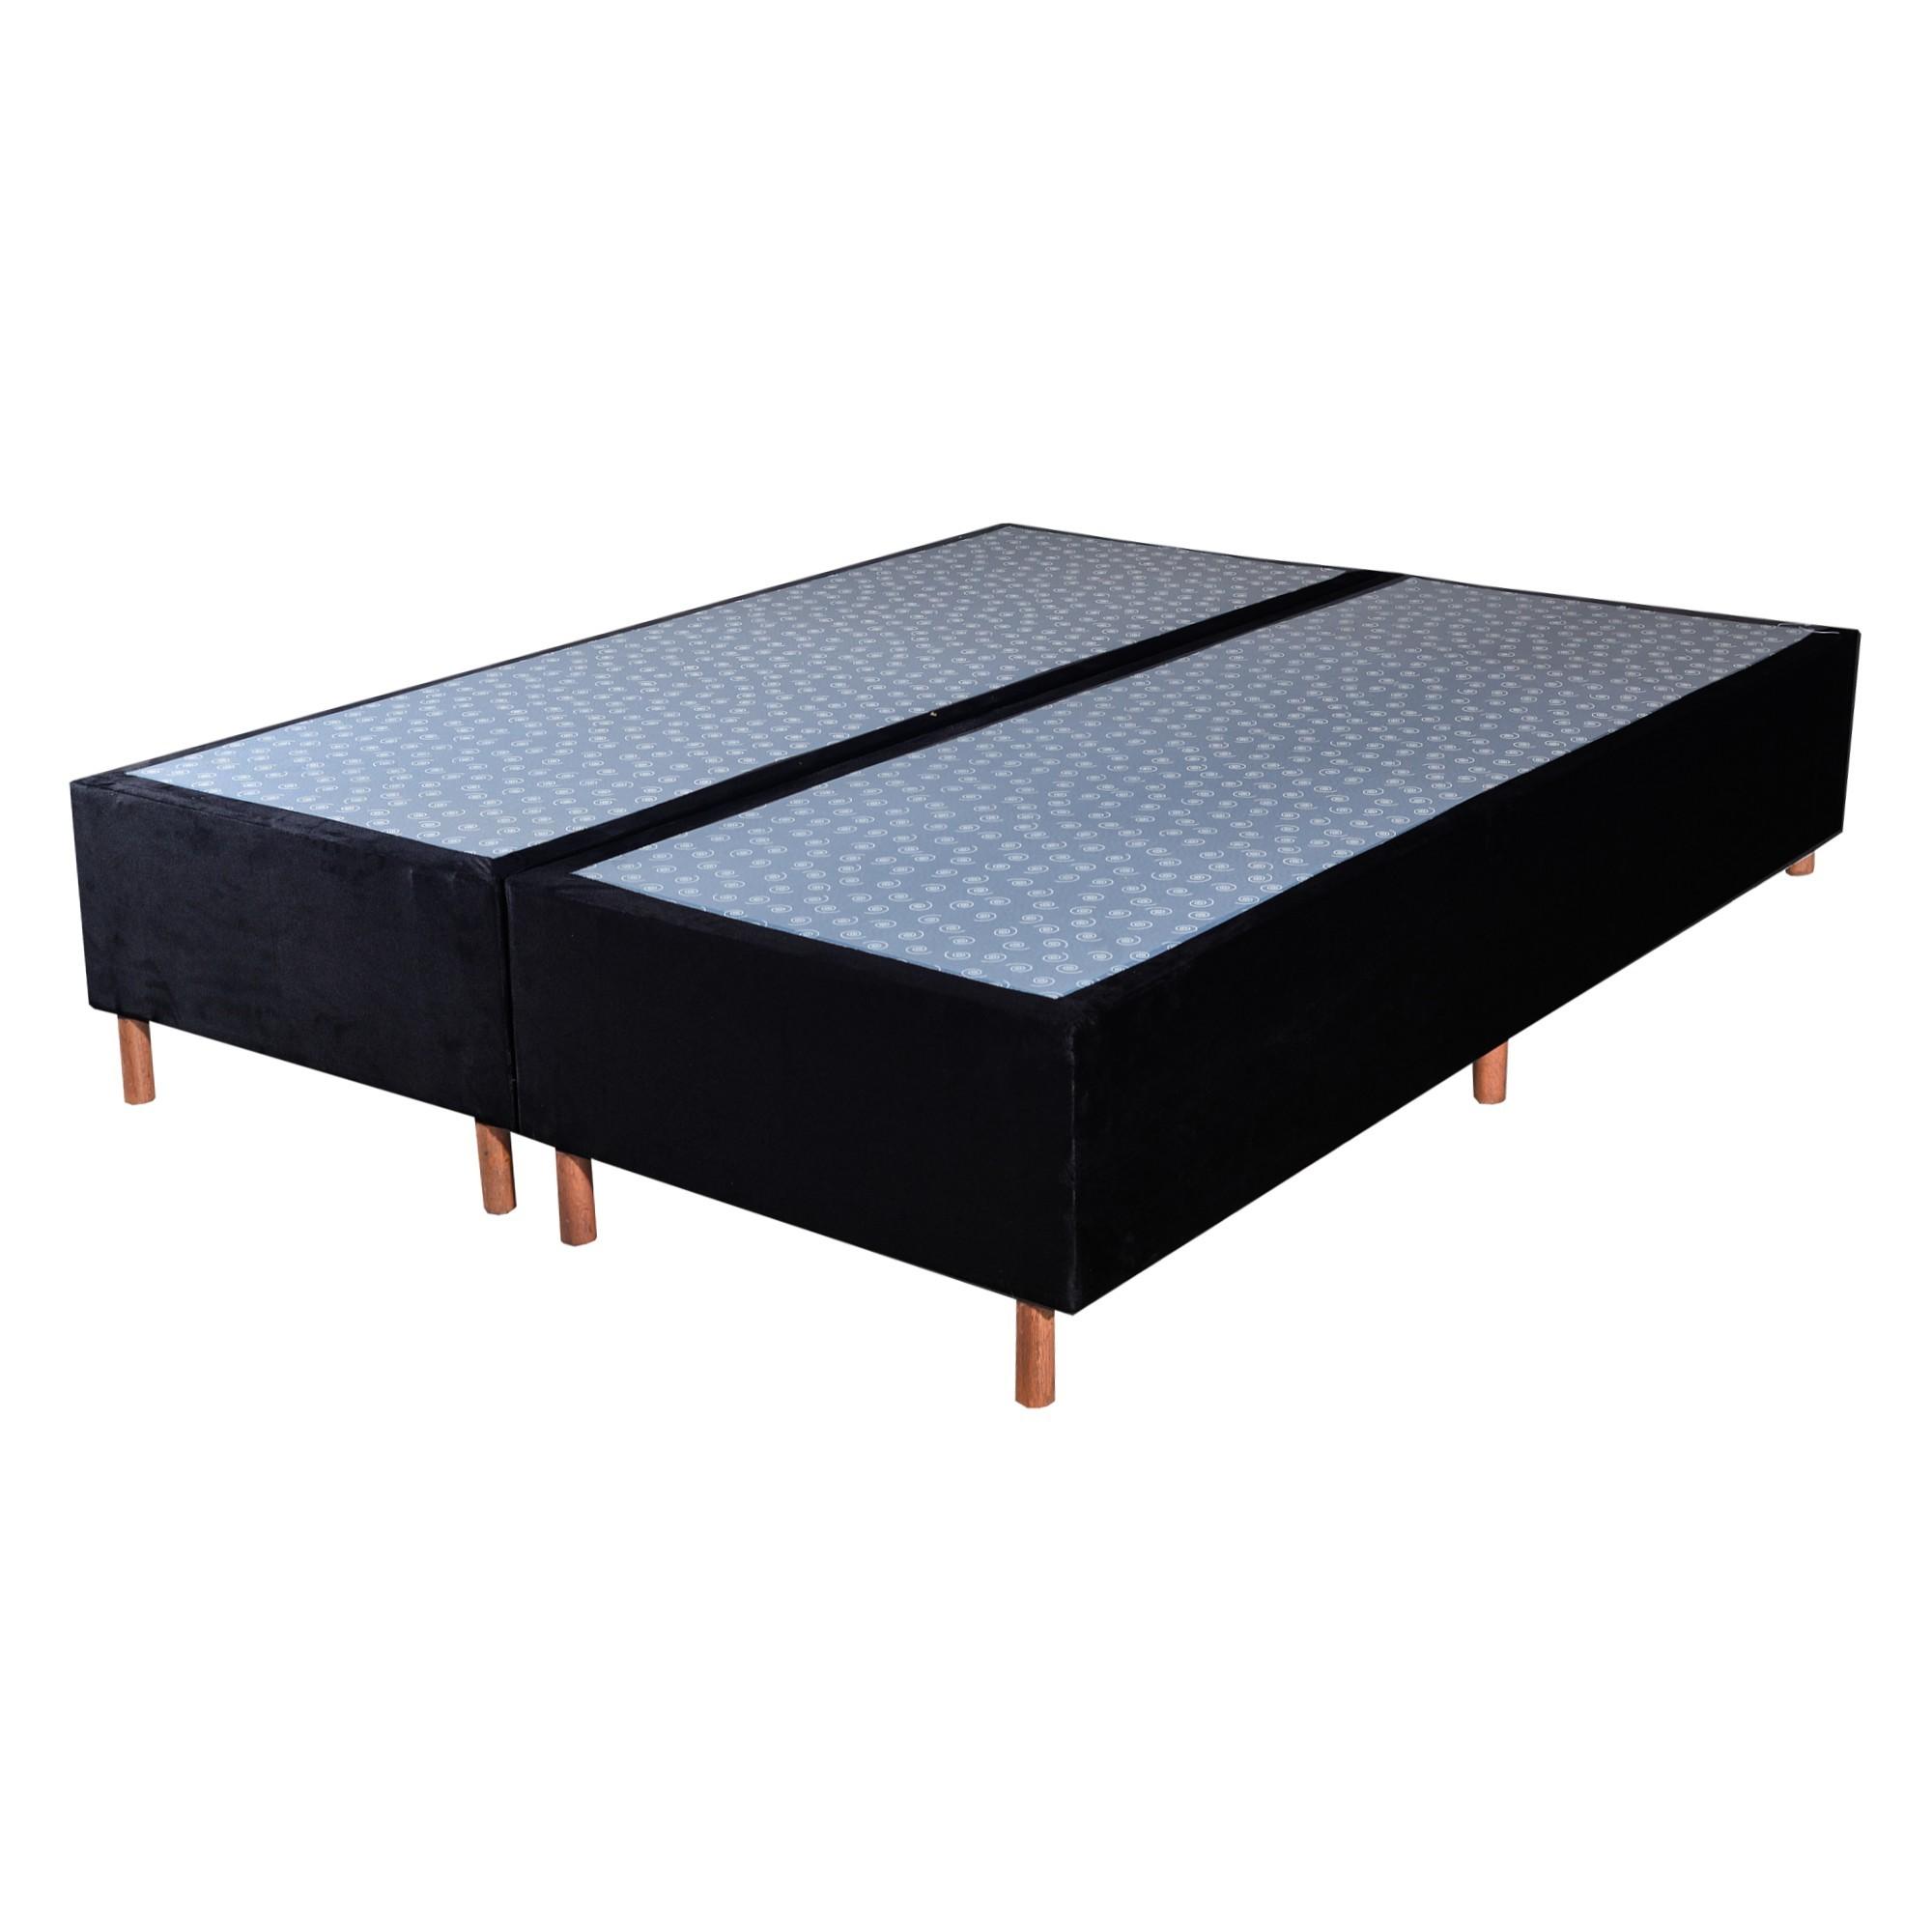 Cama Box Base King Veludo Preto 193x203x25